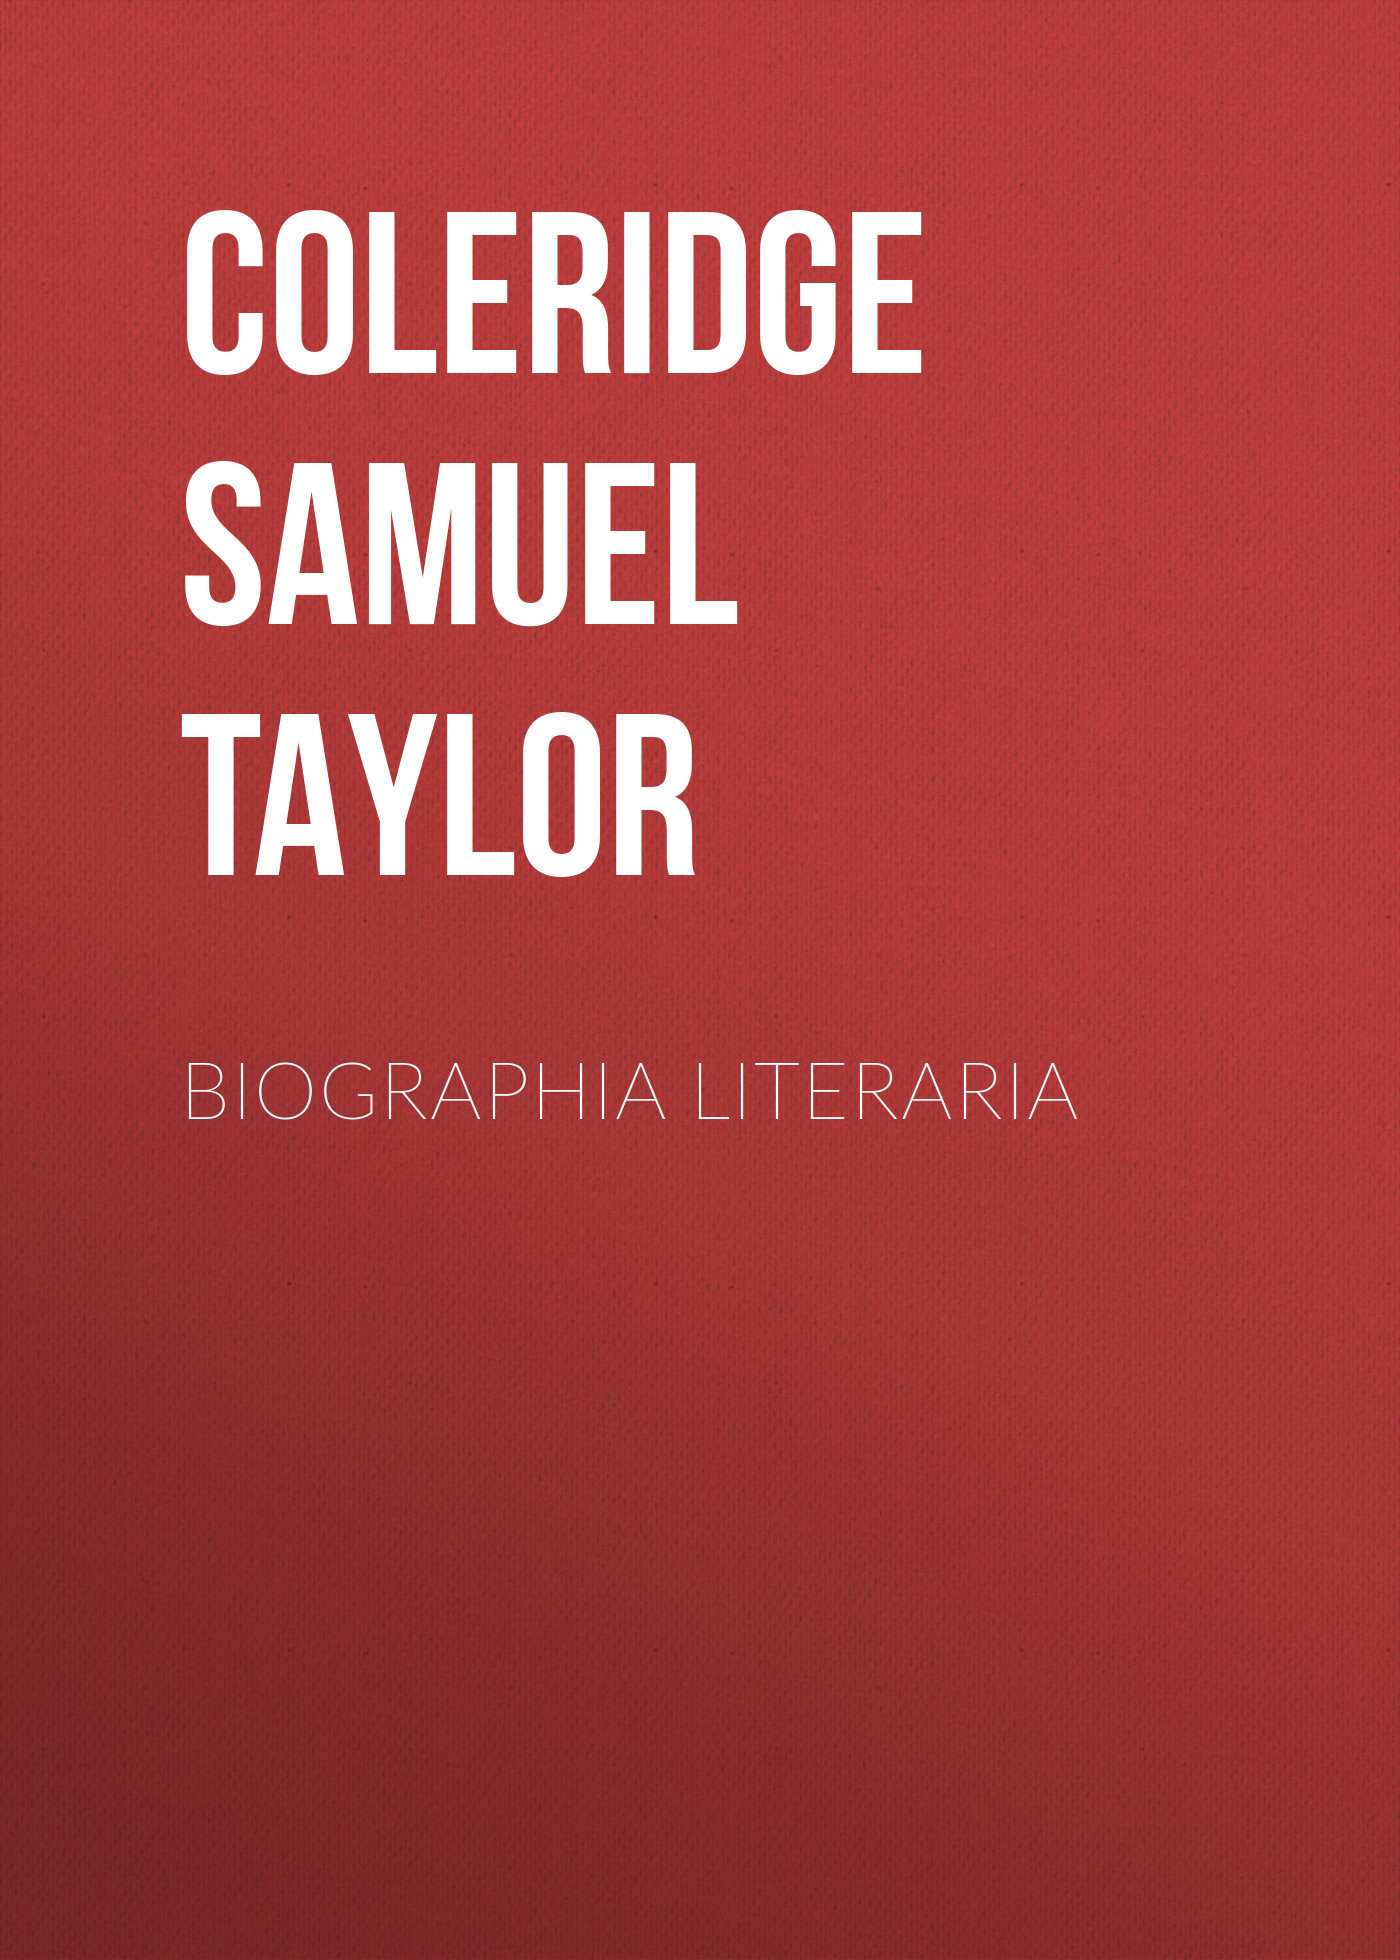 Coleridge Samuel Taylor Biographia Literaria coleridge poems